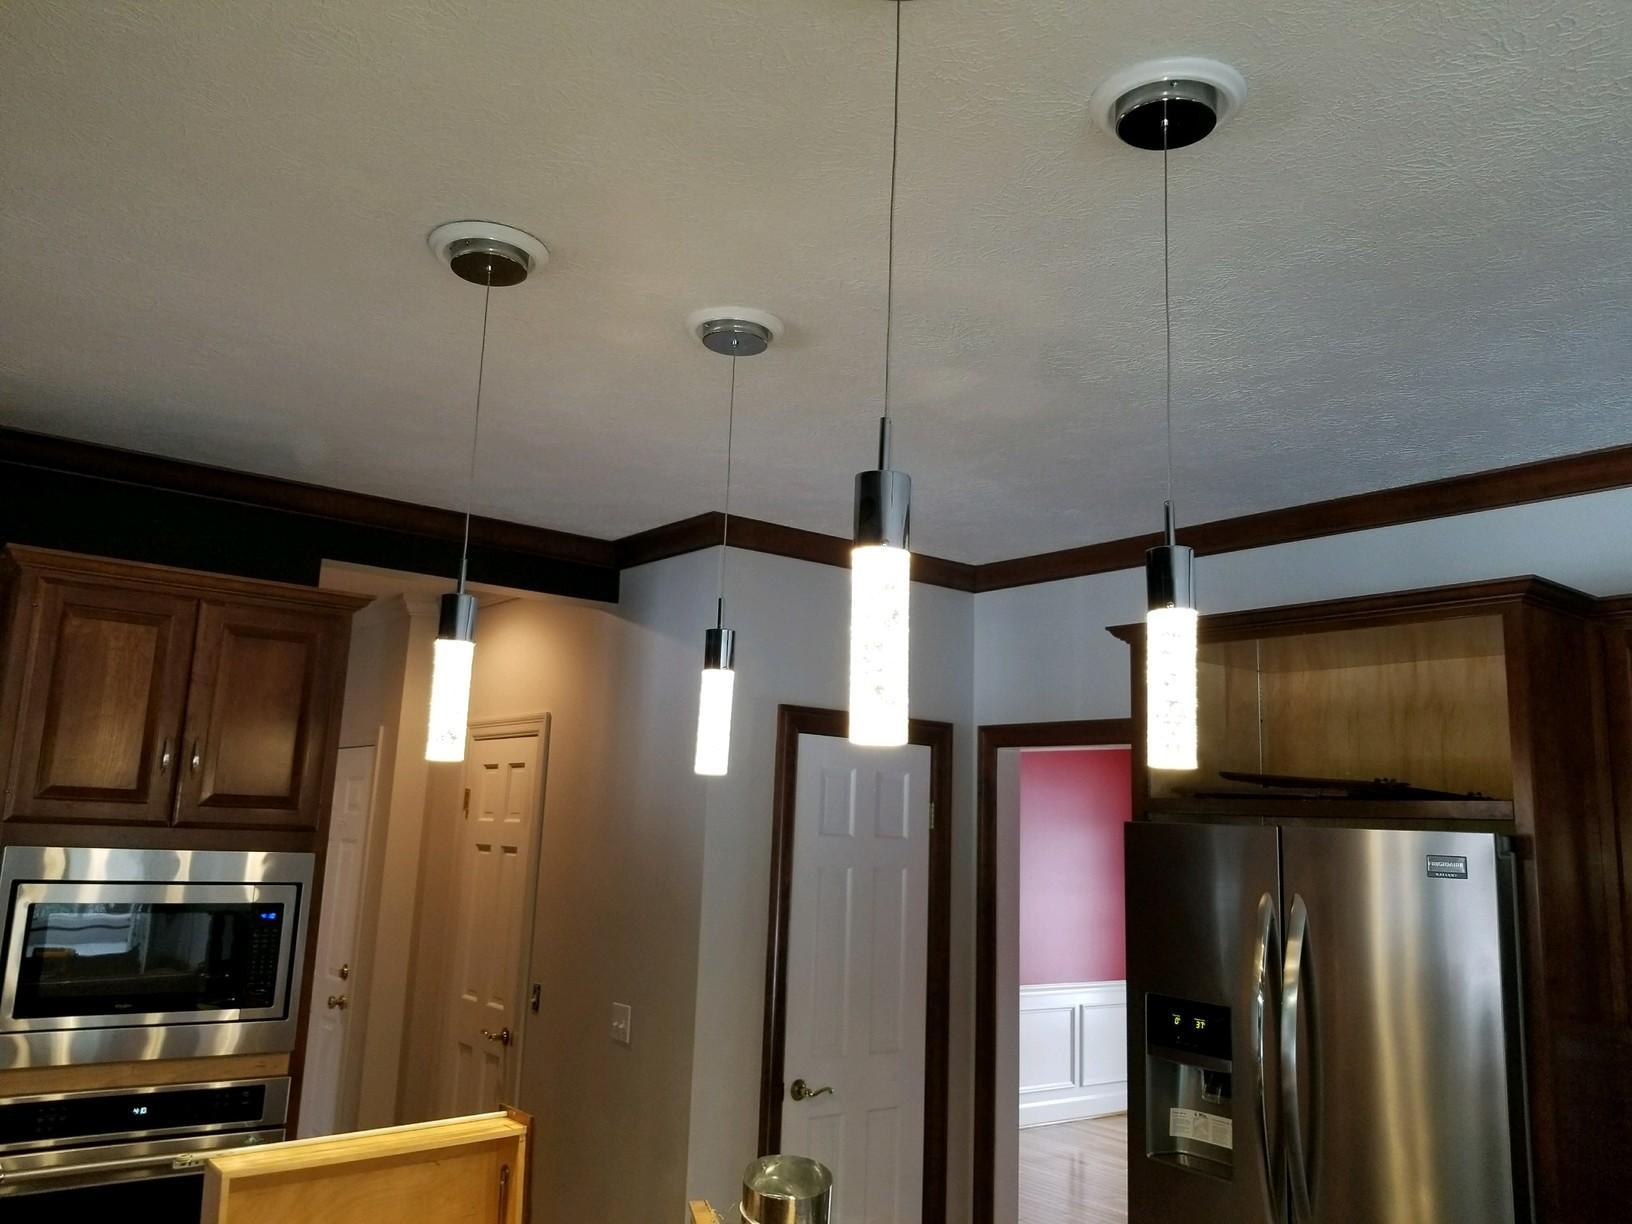 Pendant lighting in kitchen area